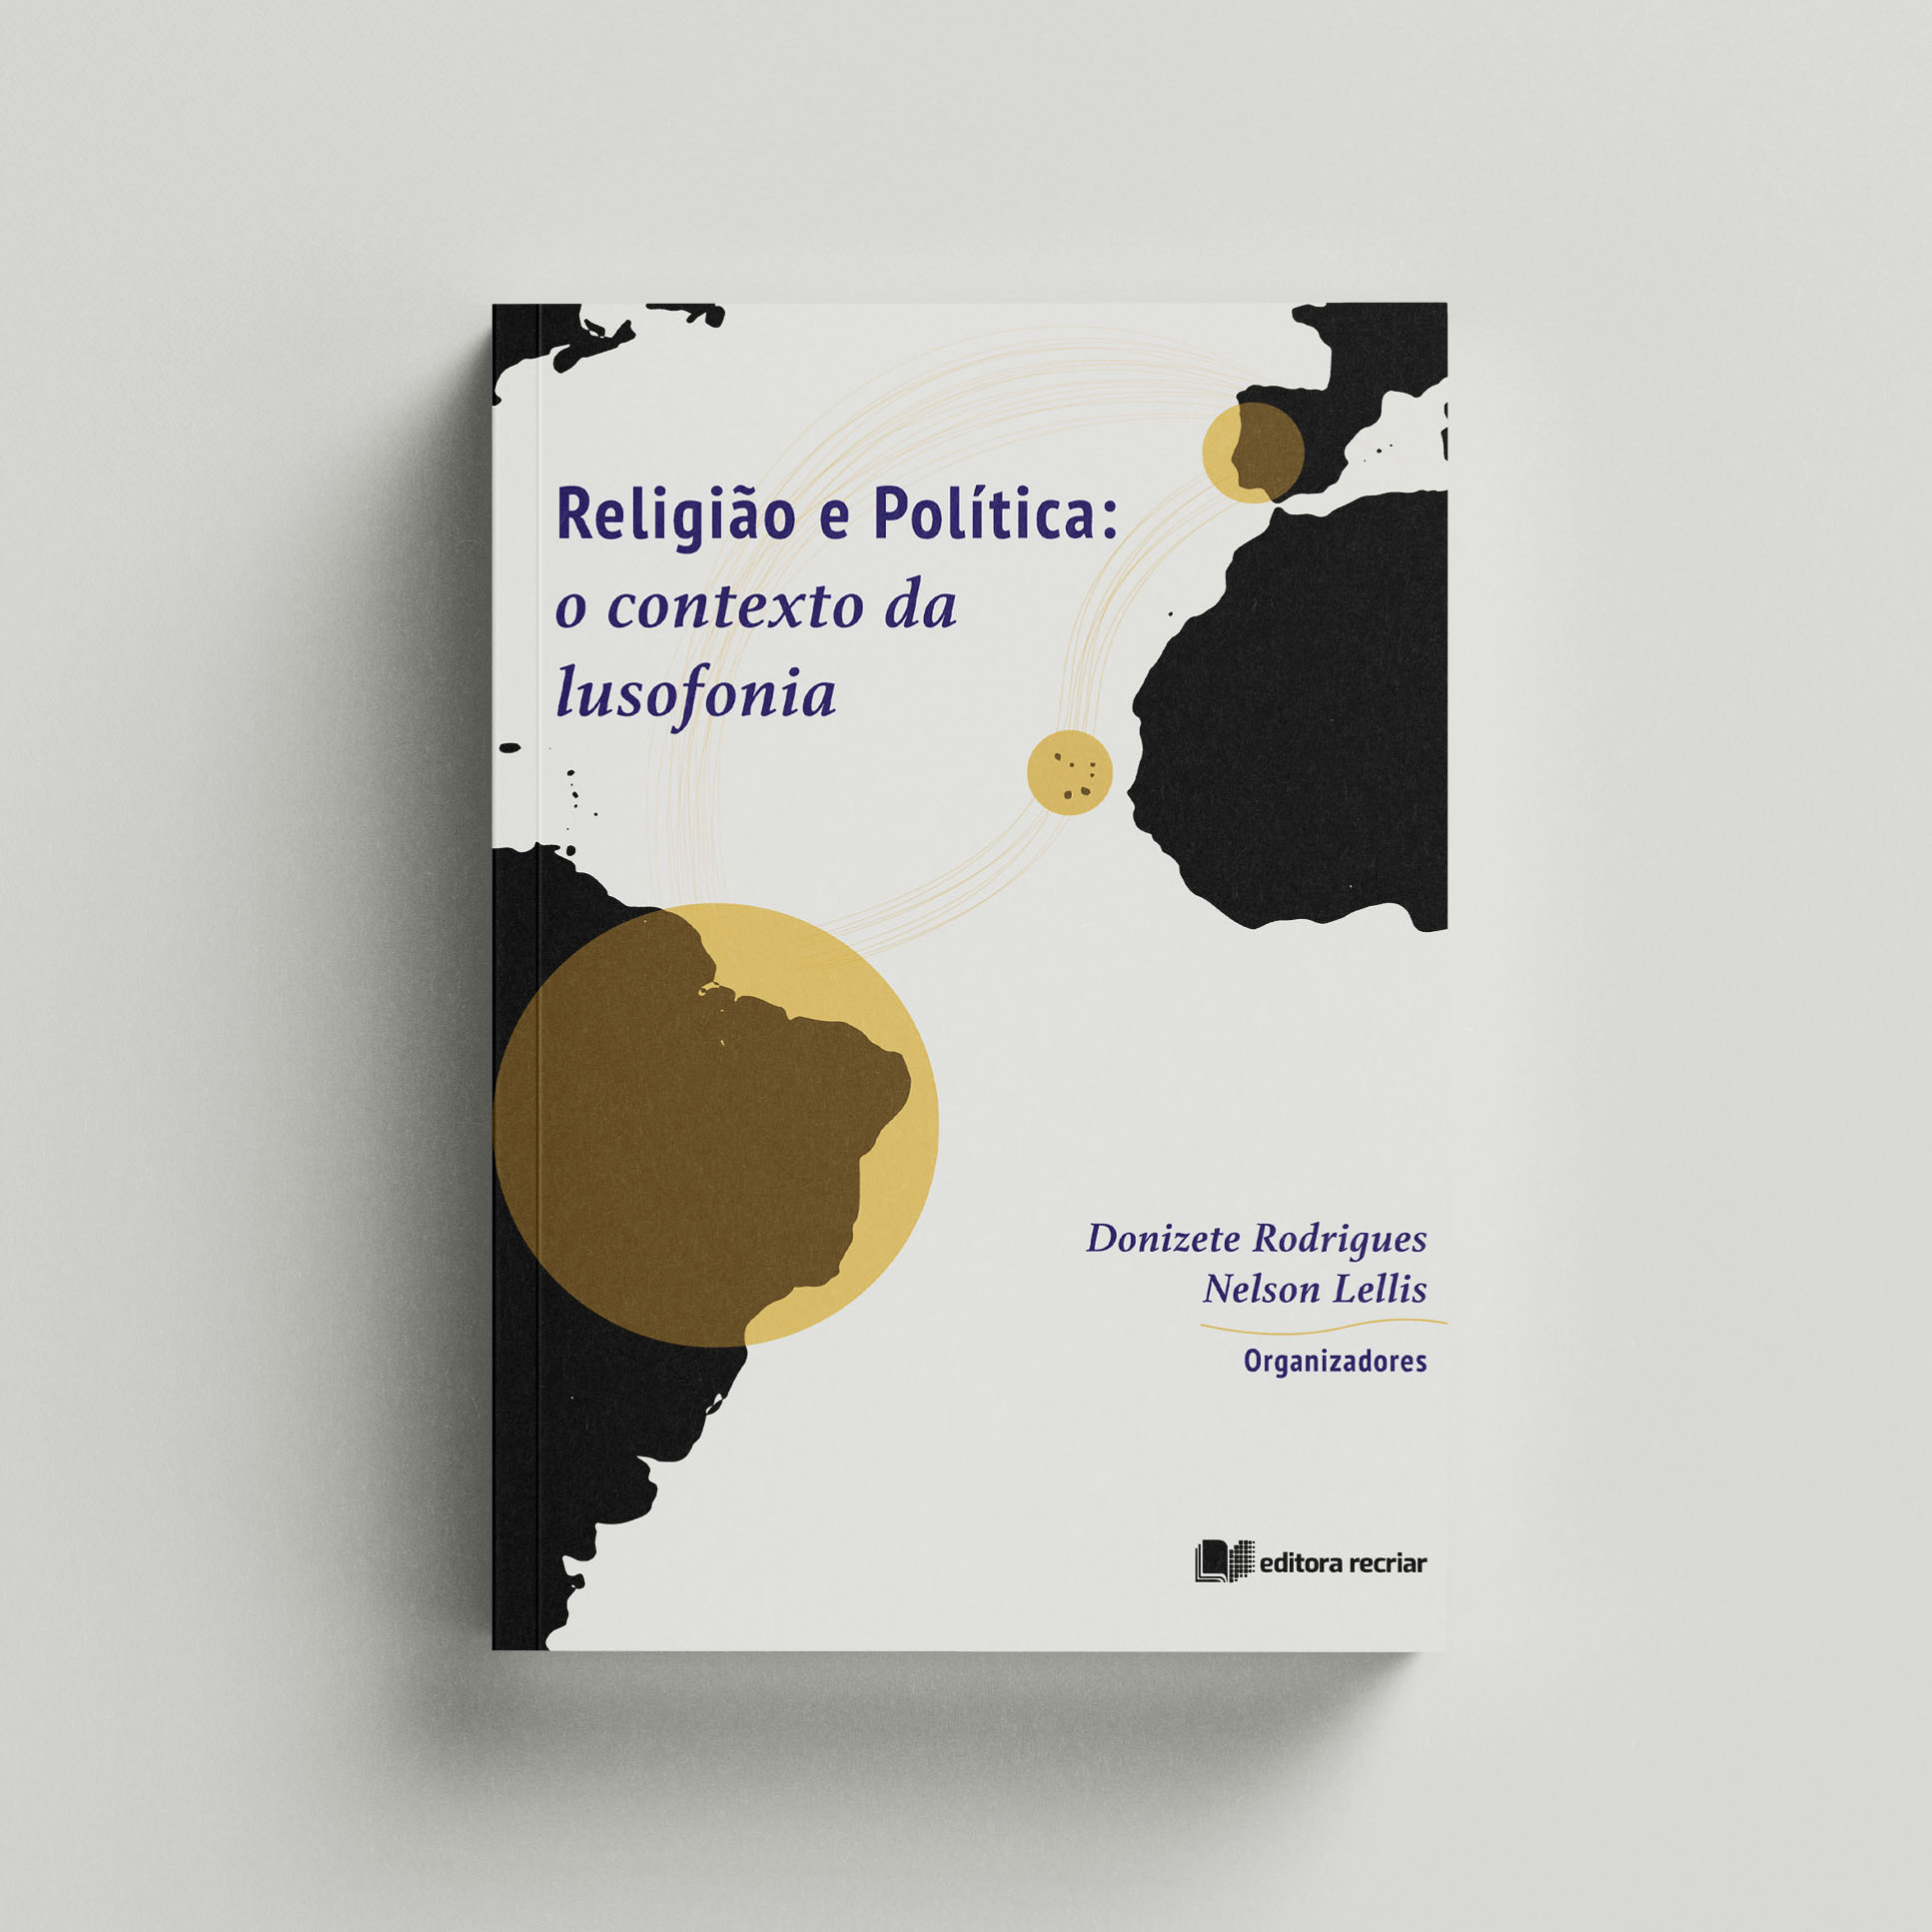 Religião e Política: o contexto da lusofonia - Donizete Rodrigues e Nelson Lellis (Org.)